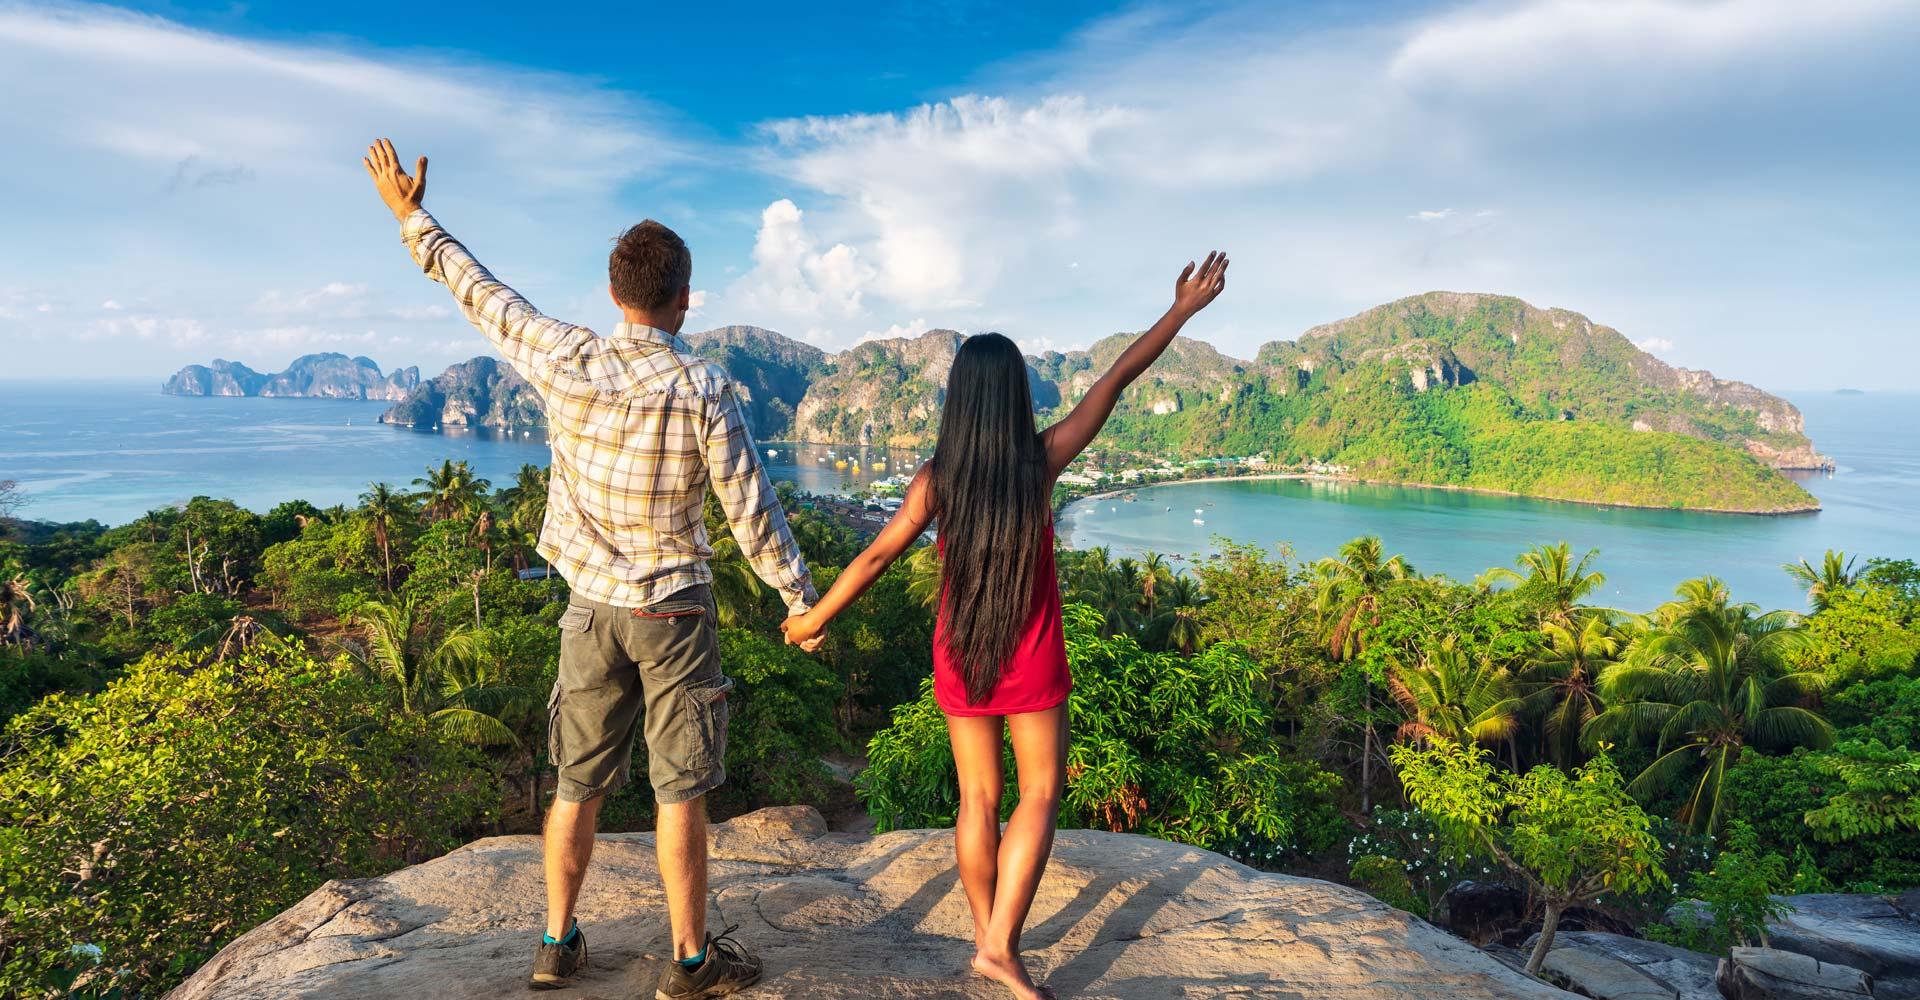 Phuket Experiences, Mangosteen Experiences, Ayurveda, Wellness, Yoga Retreats, Phuket Thailand, Mangosteen Ayurveda & Wellness Resort, Number 1 Ayurveda Resort in Thailand, Rawai, Phuket.